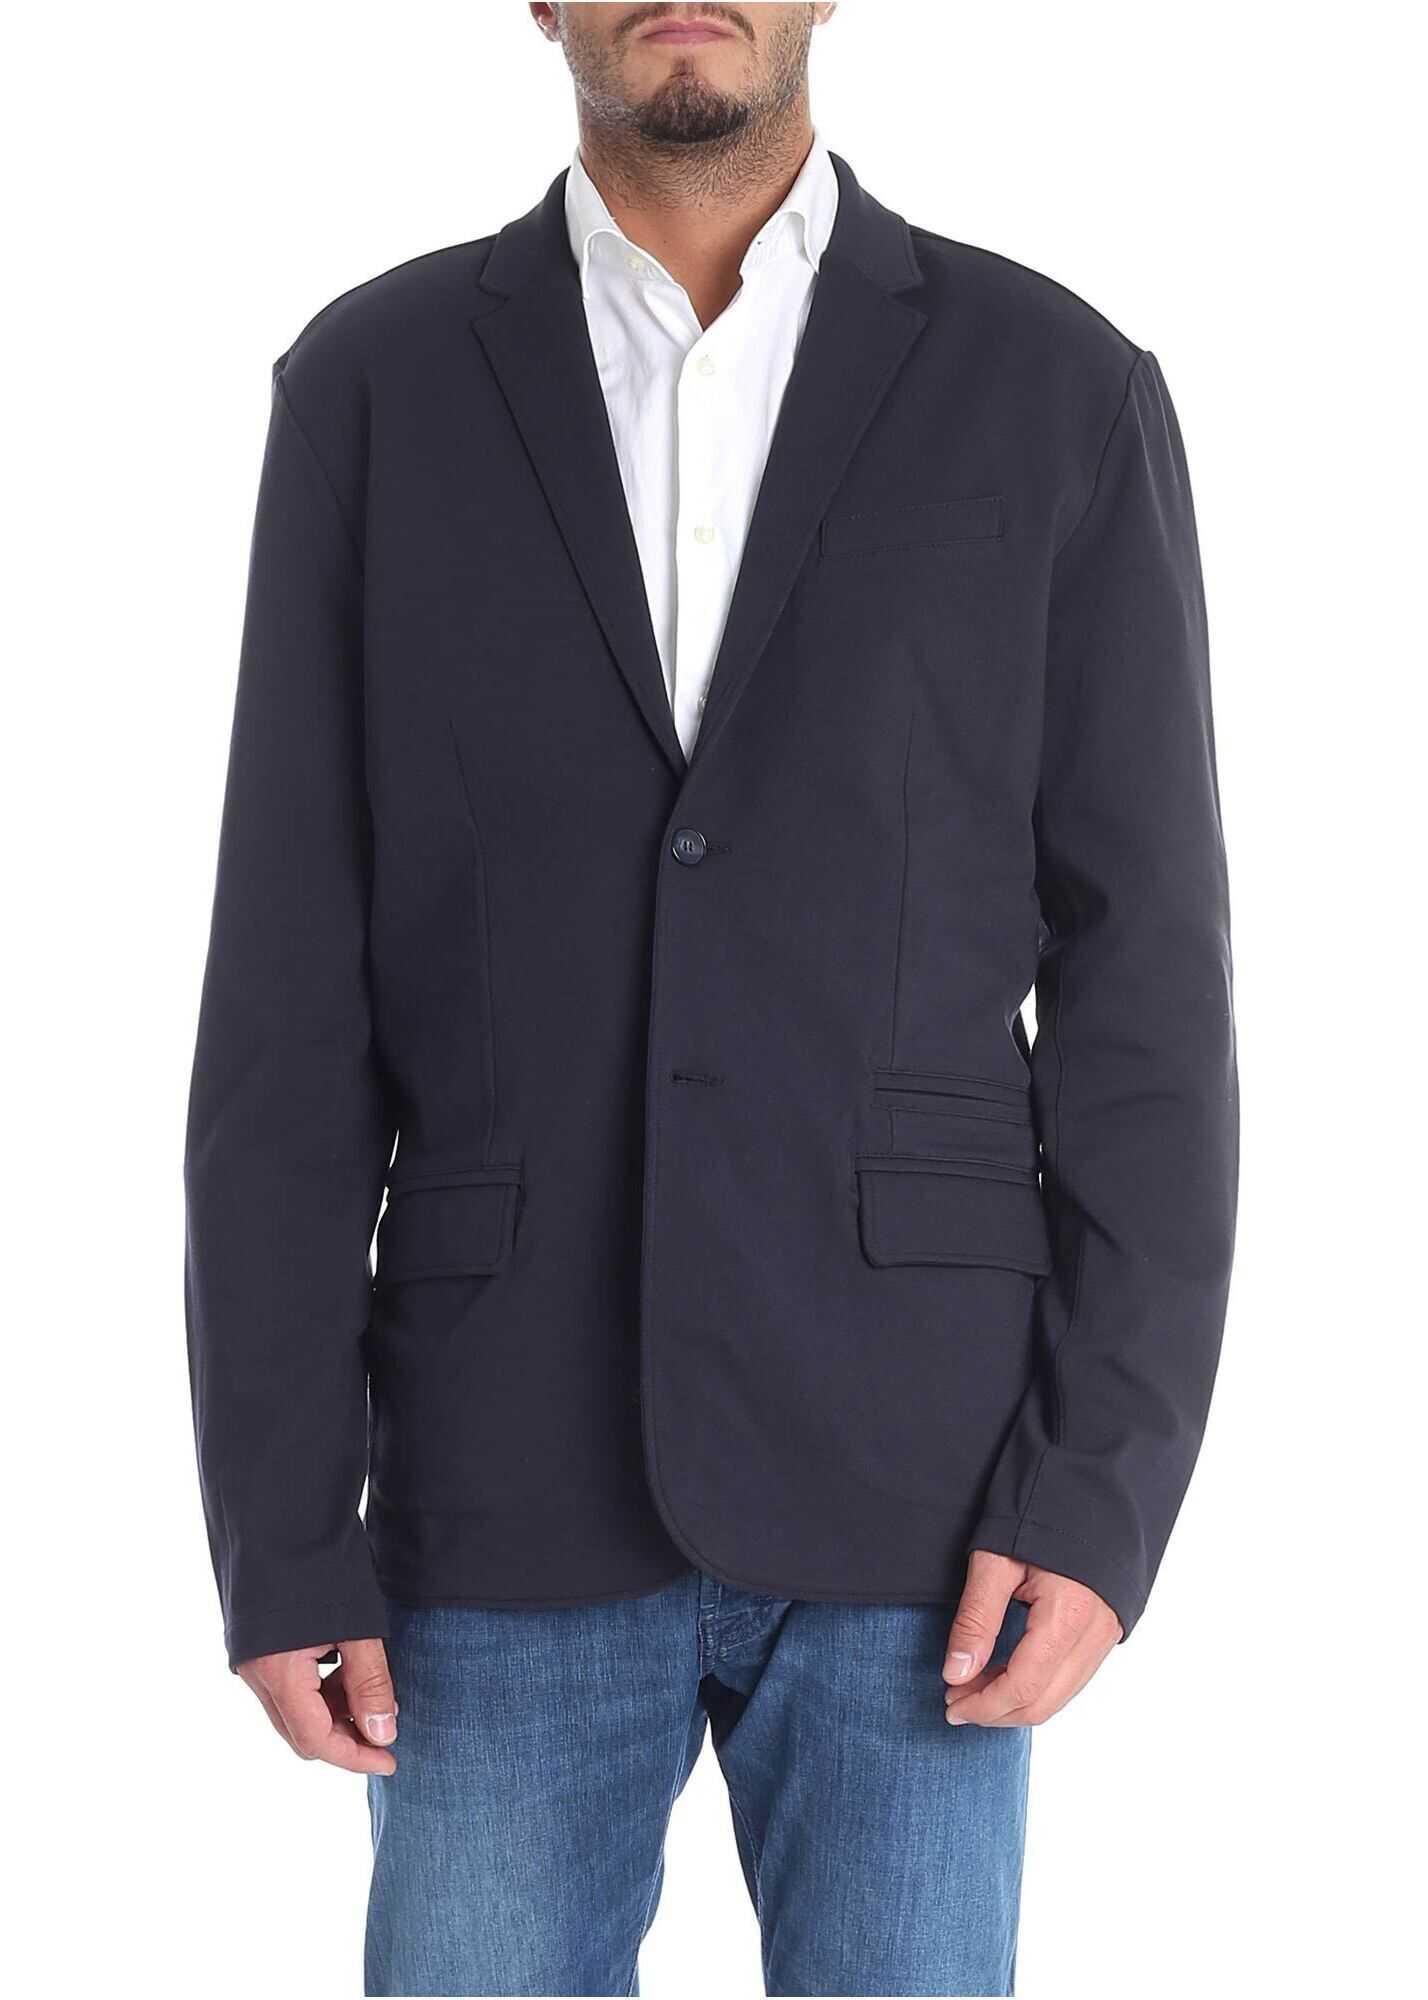 Karl Lagerfeld Blue Milano Fabric Jacket Blue